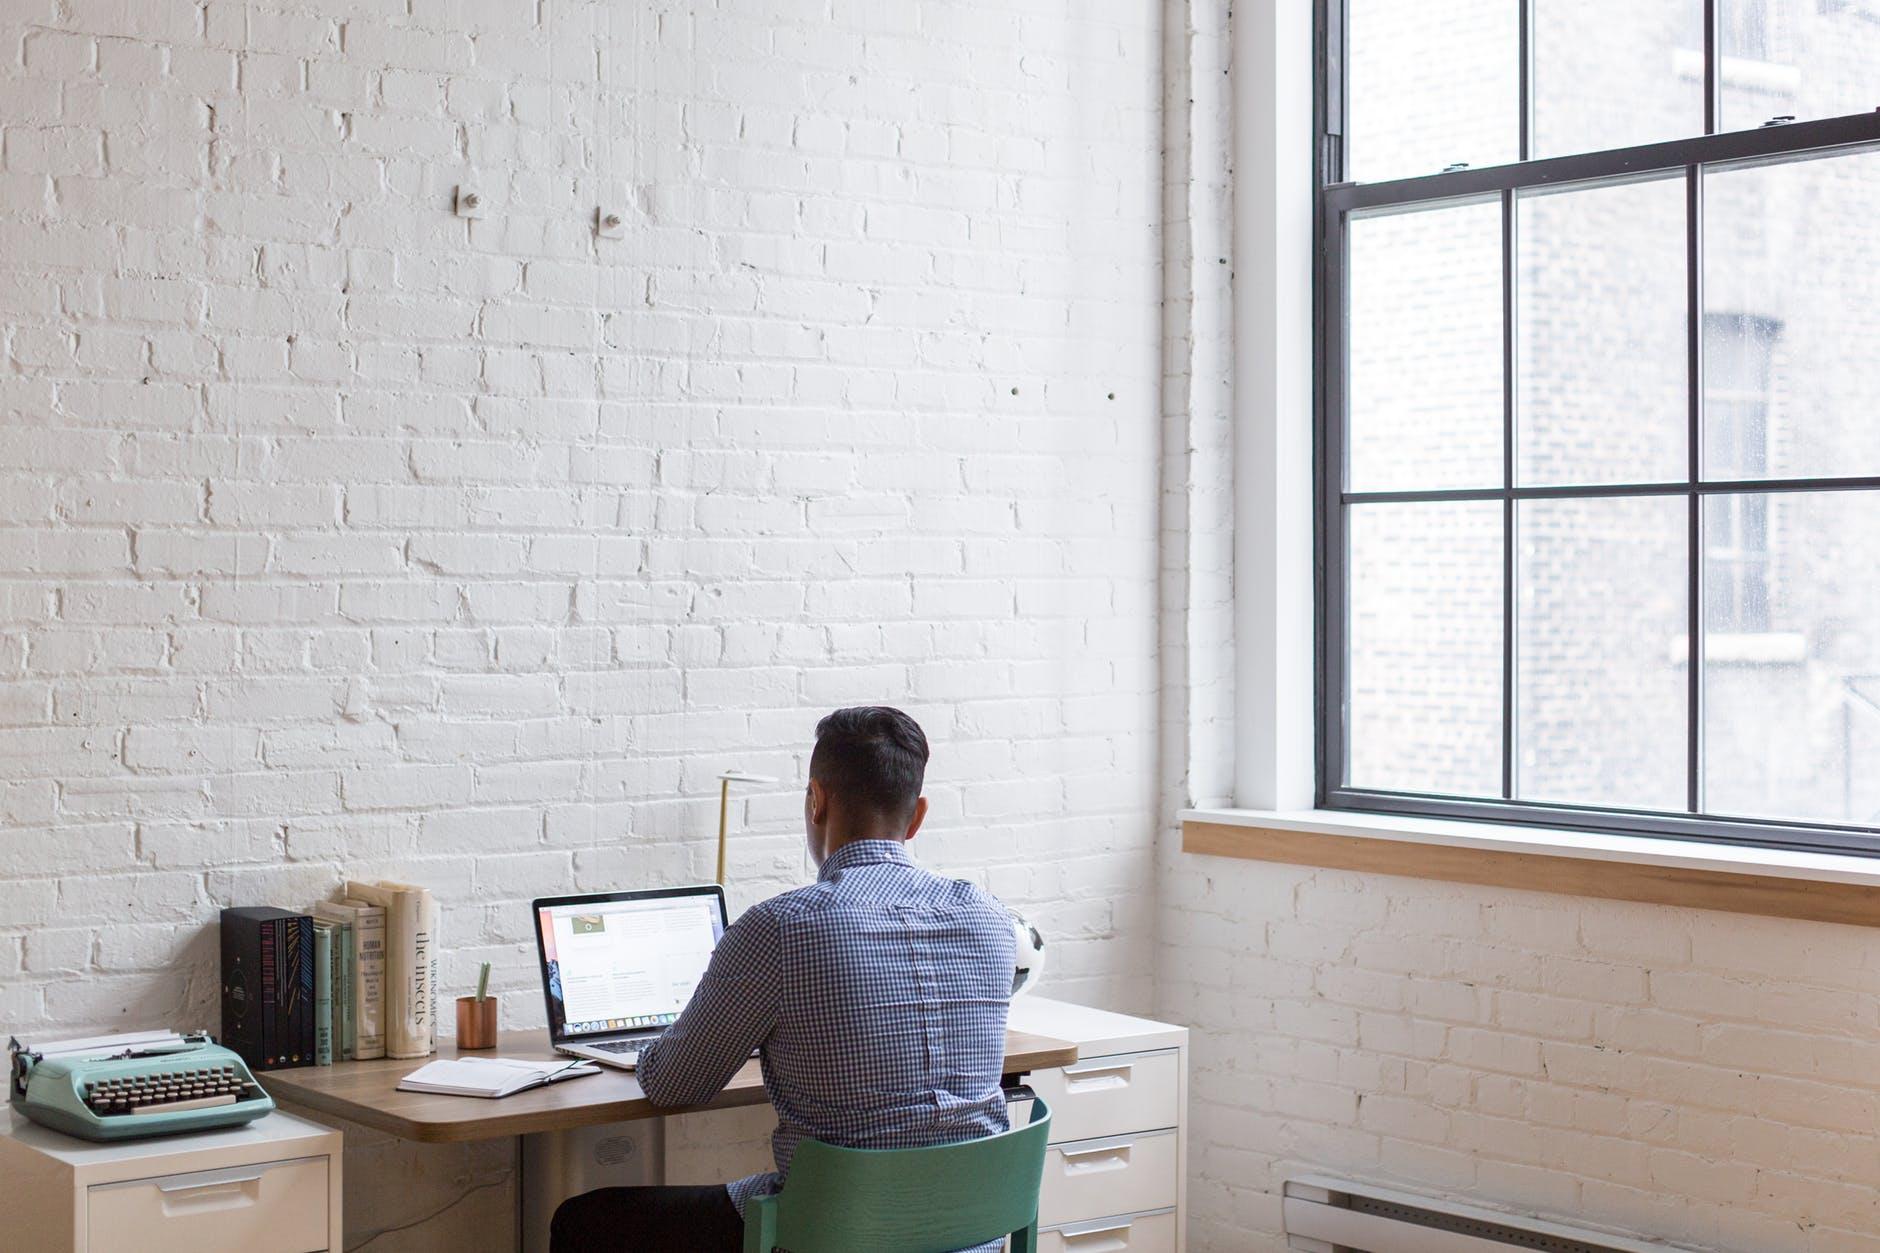 Mental Health Remote Working